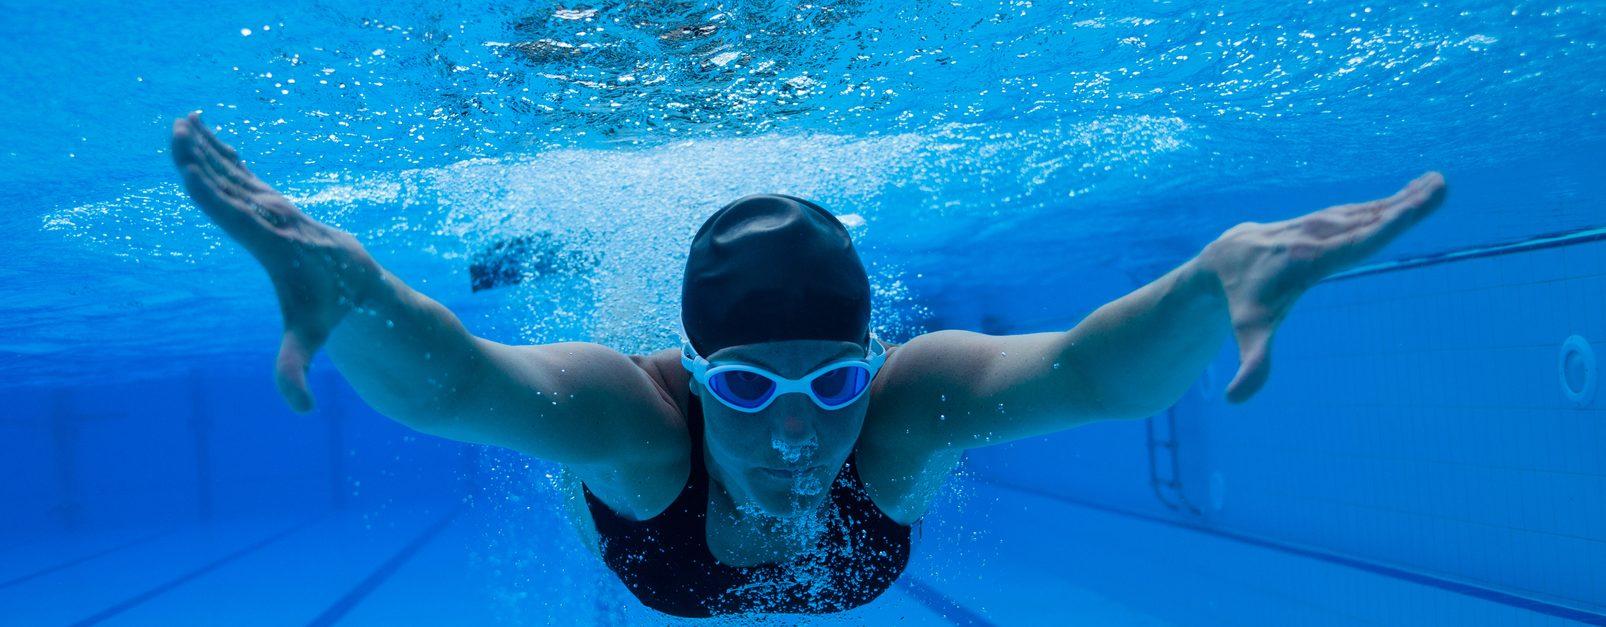 http://www.swimmer.ru/wp-content/uploads/2017/05/swimming-underwater-e1498807429486.jpg